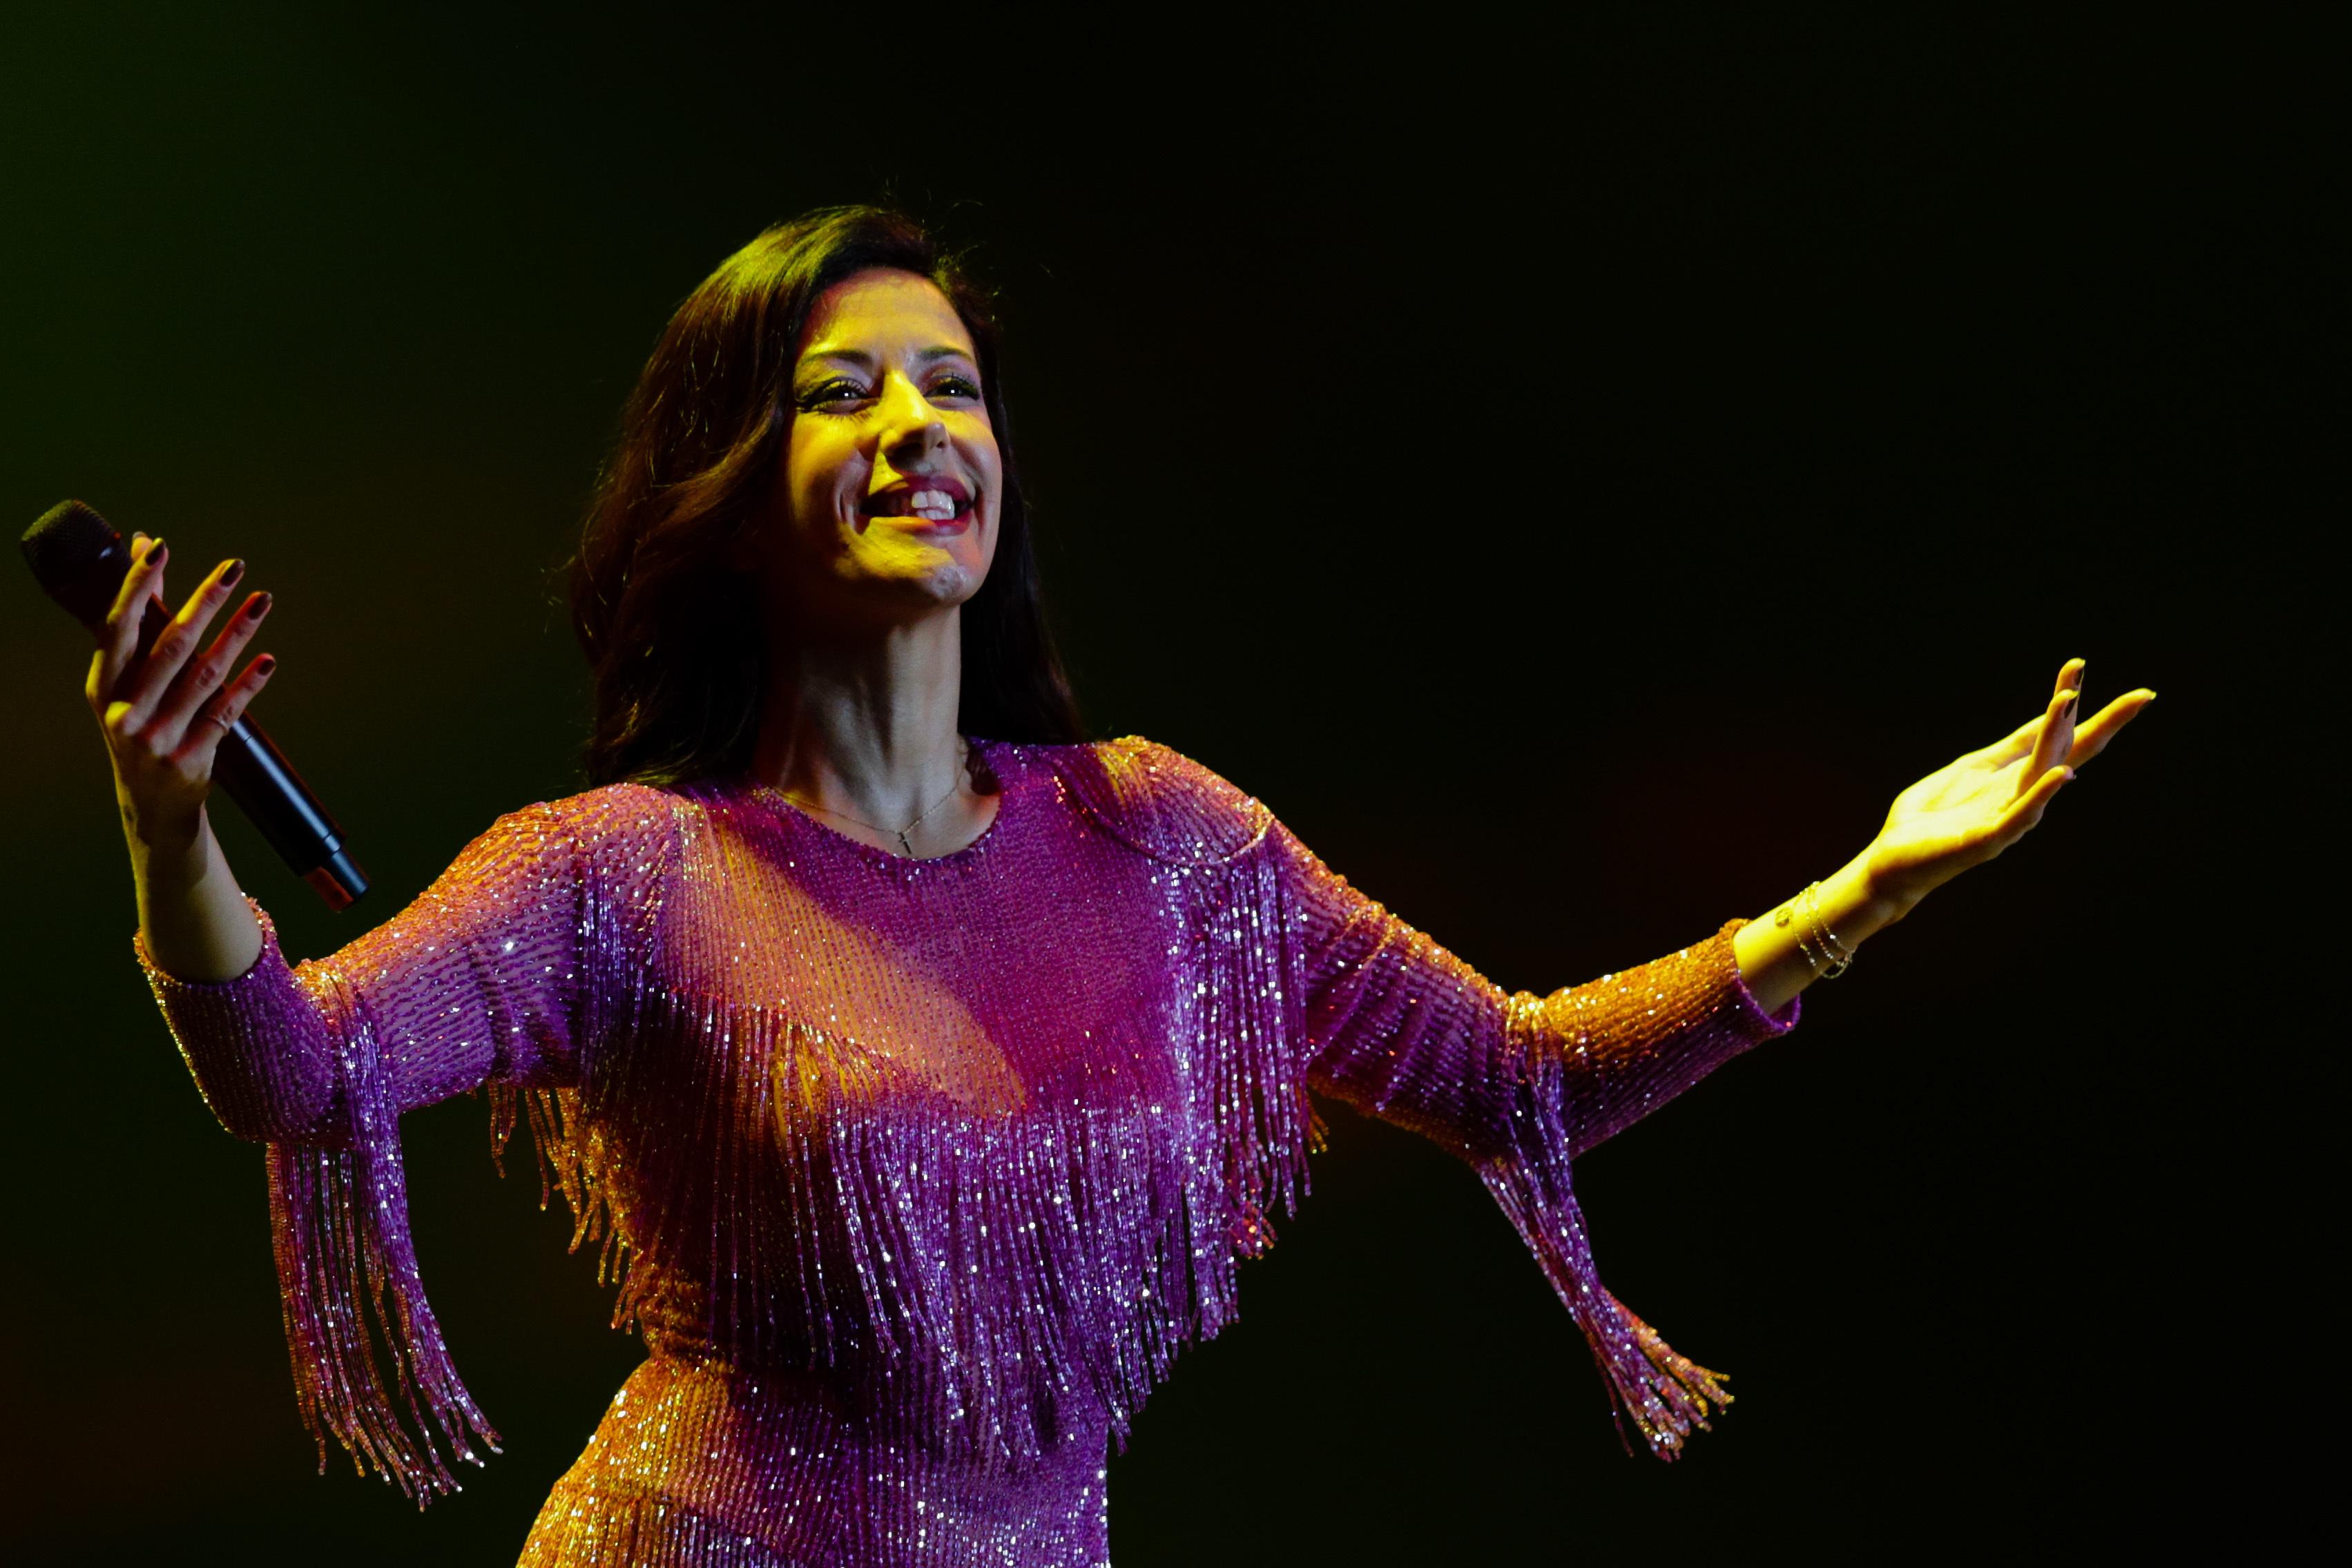 Fadista Ana Moura junta-se a concerto de homenagem a Lhasa de Sela no Canadá